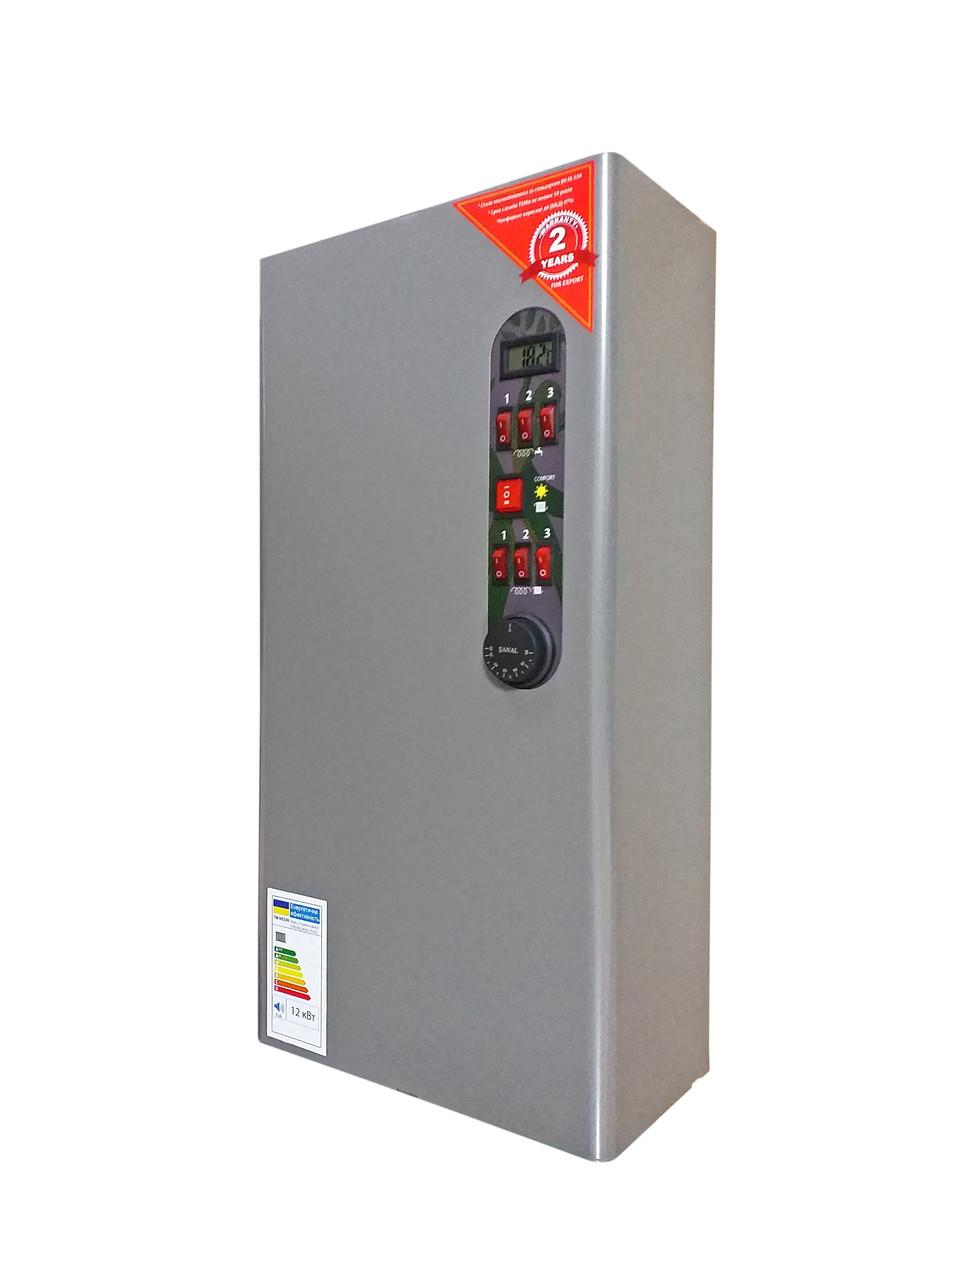 Электрокотел 2-х контурный WCS/WH 6 кВт (тих. ход, насос, 220/380 В)